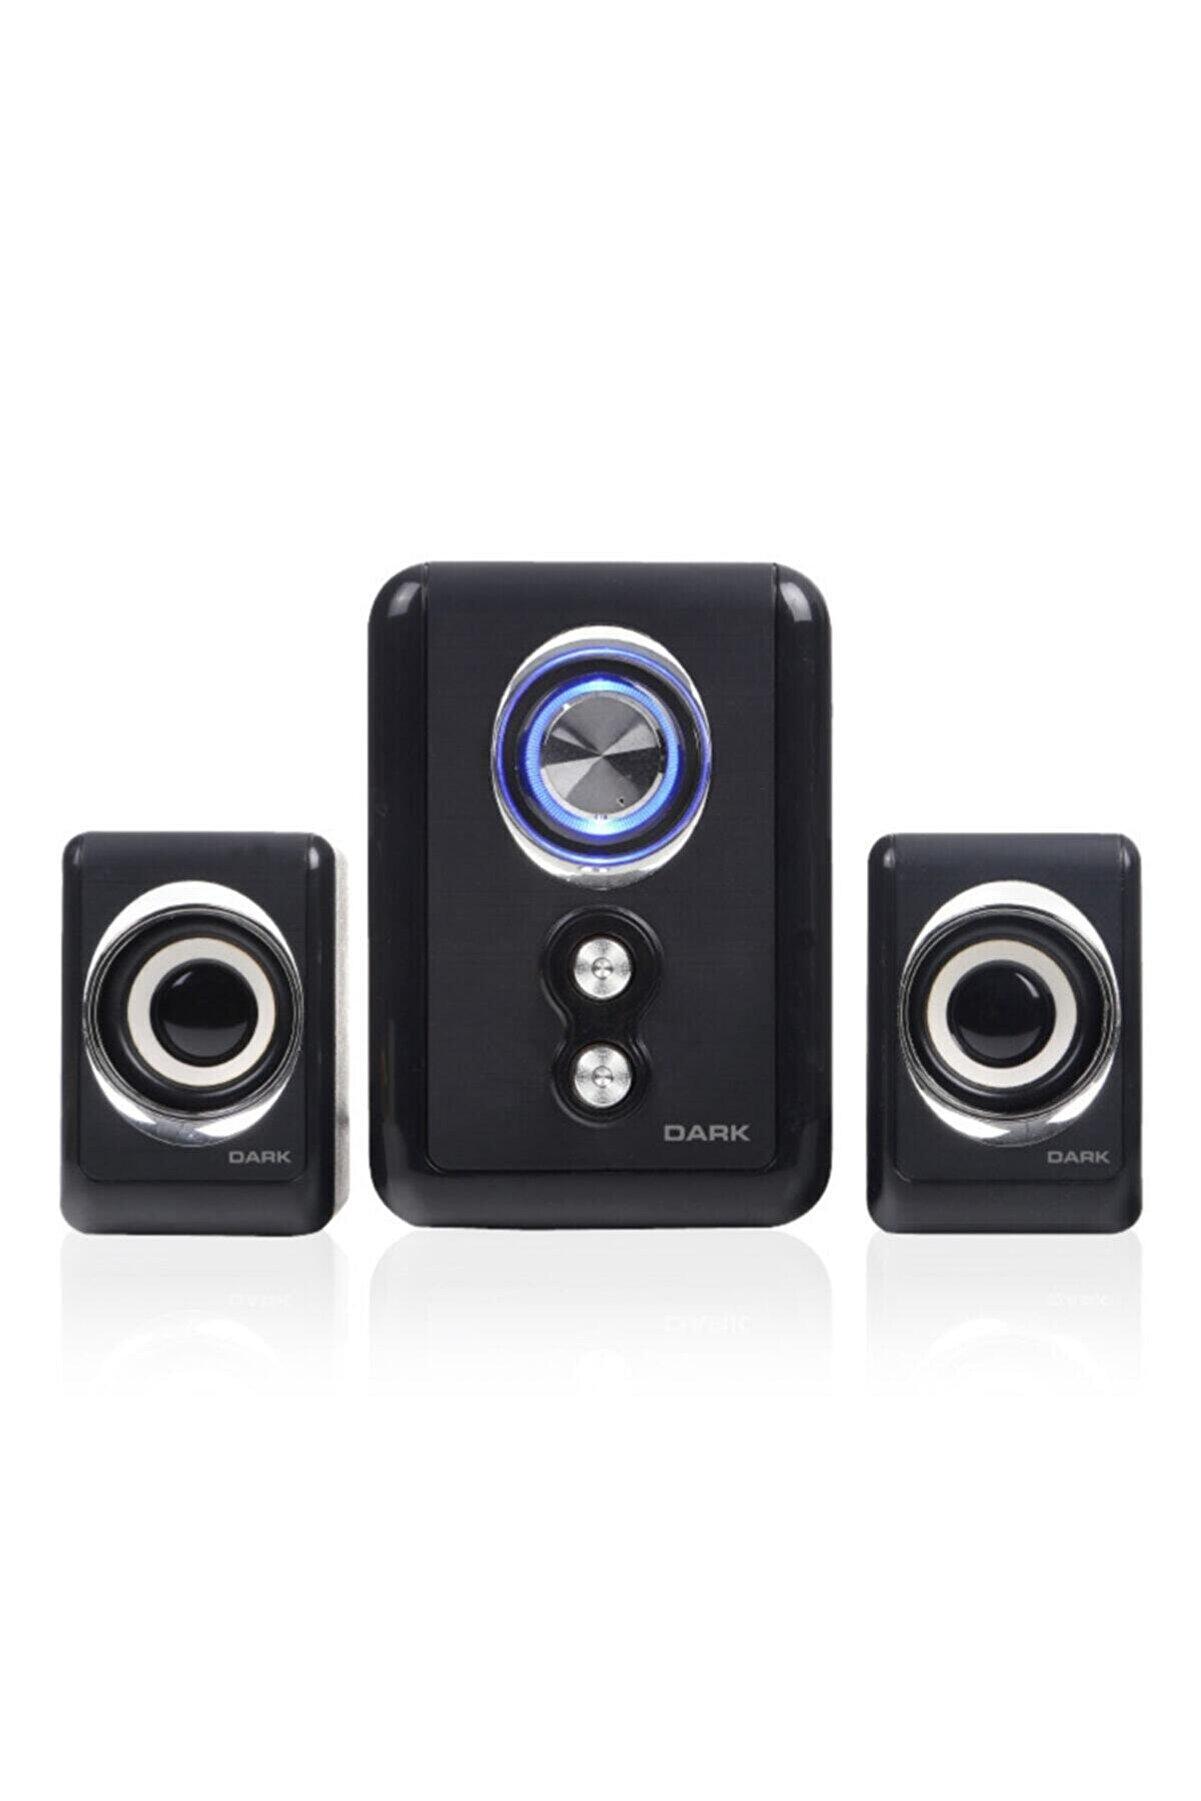 Dark Spk Dk-ac-sp211 +1 Multimedia Usb Speaker